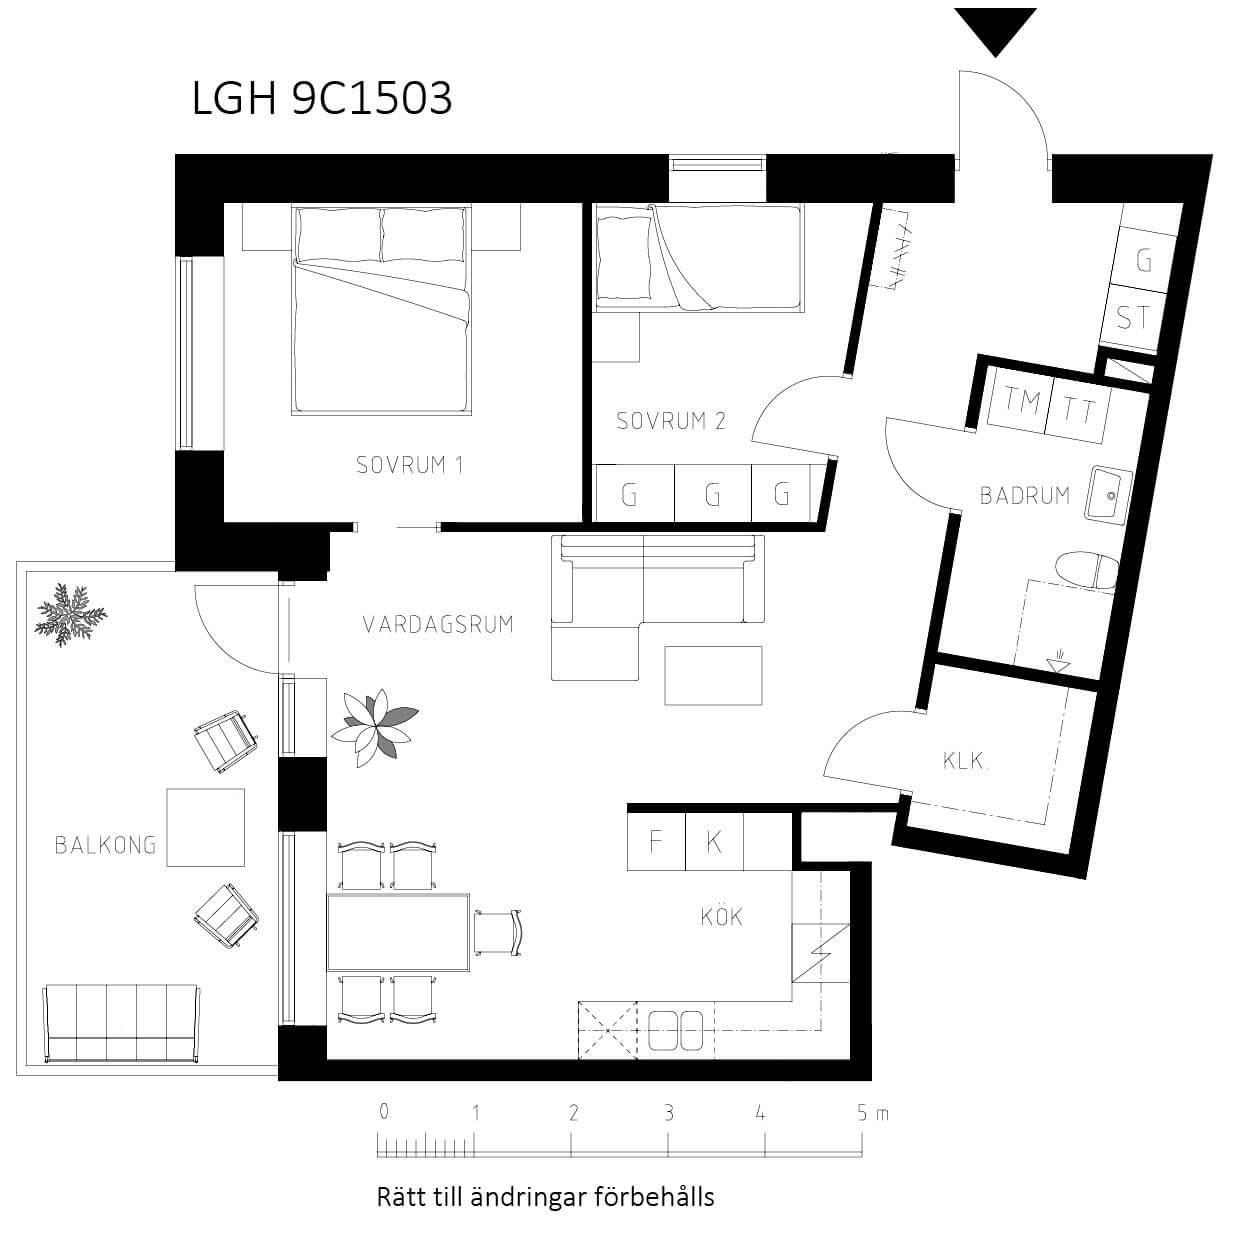 lgh_9C1503